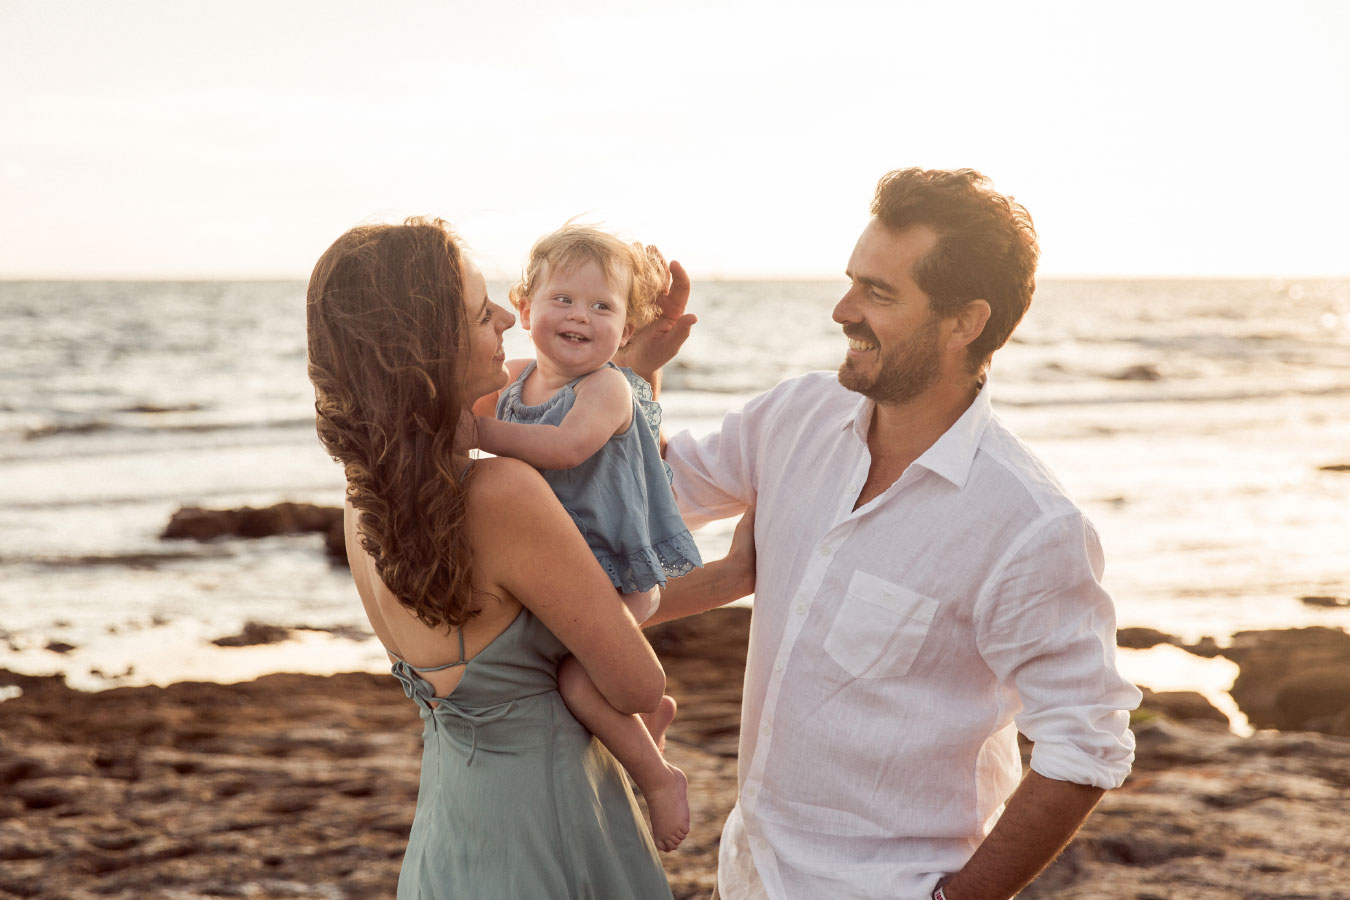 brighton-beach-baby-lifestlye-family-photography-74